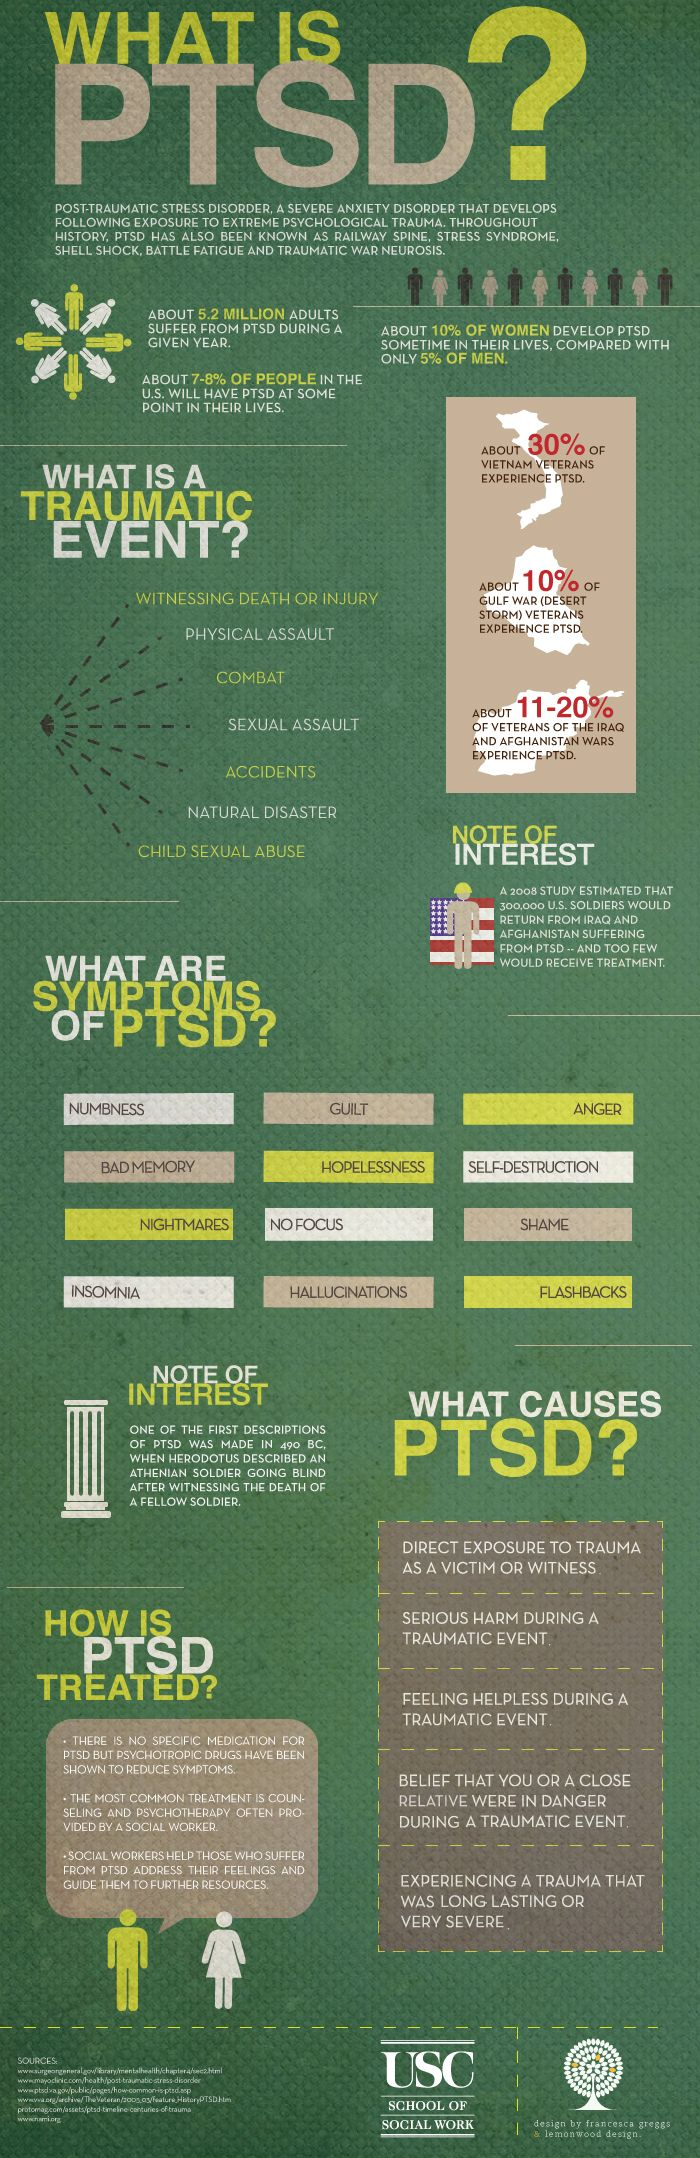 infographic on PTSD